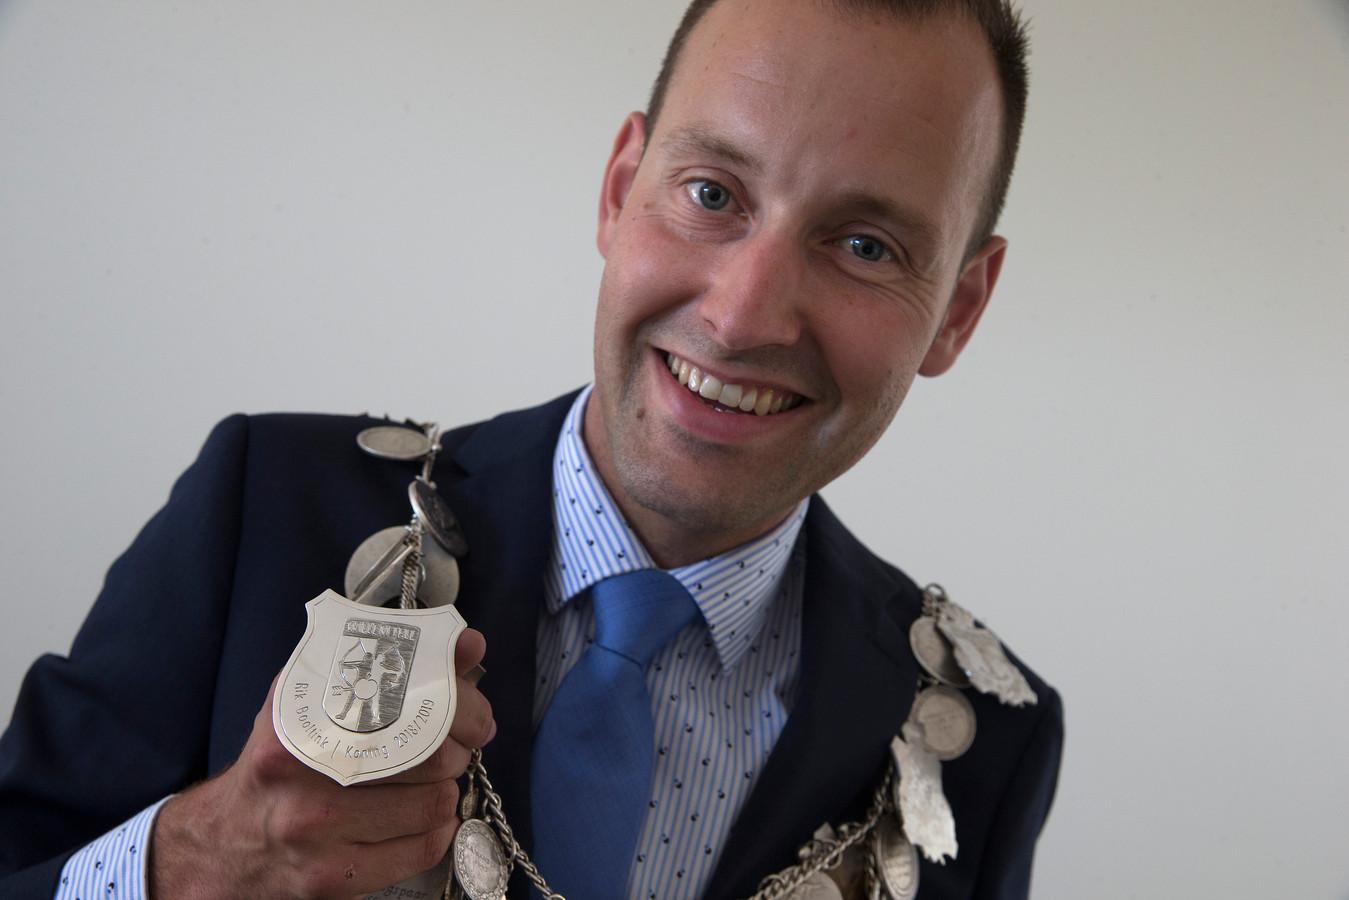 De huidige koning Rik Booltink.